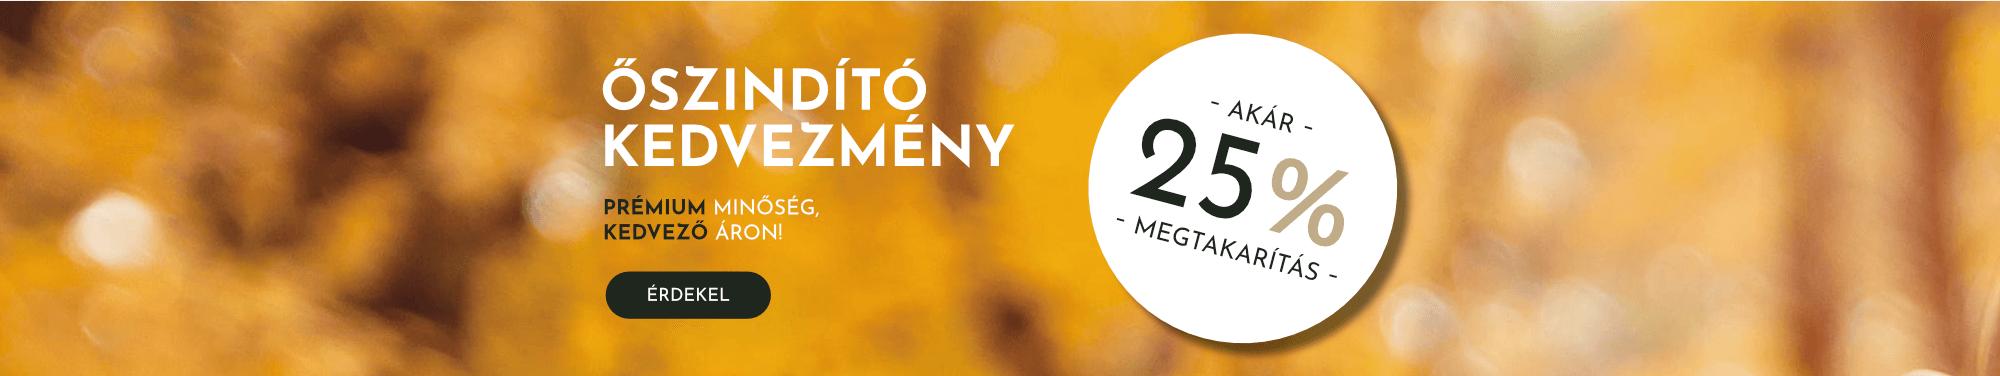 grassland-mufu-oszindito-kedvezmeny-banner-1